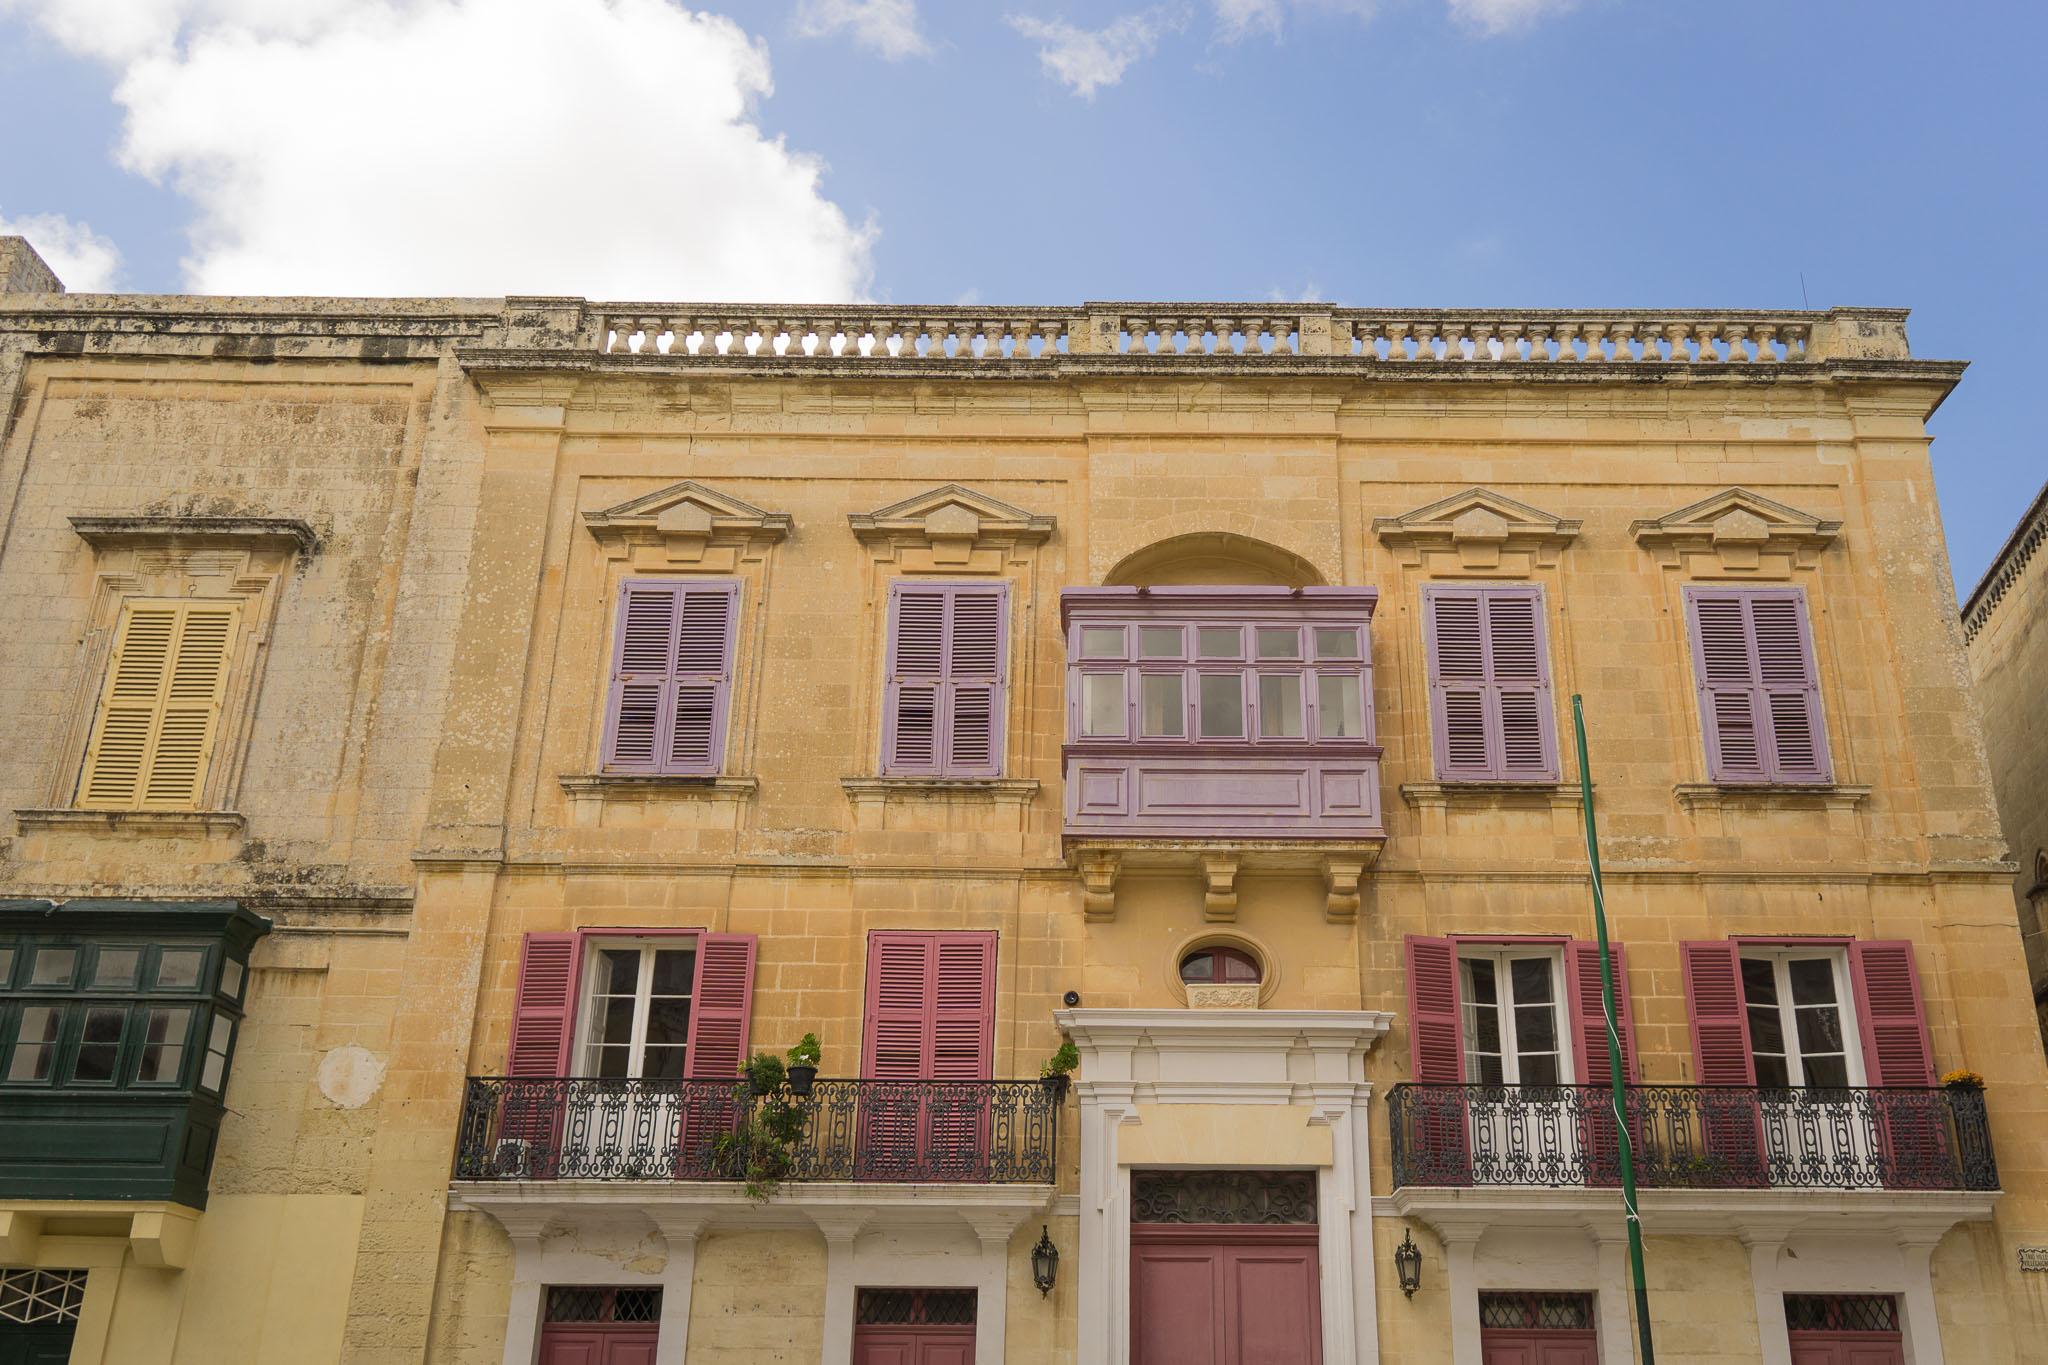 Pretty facades.